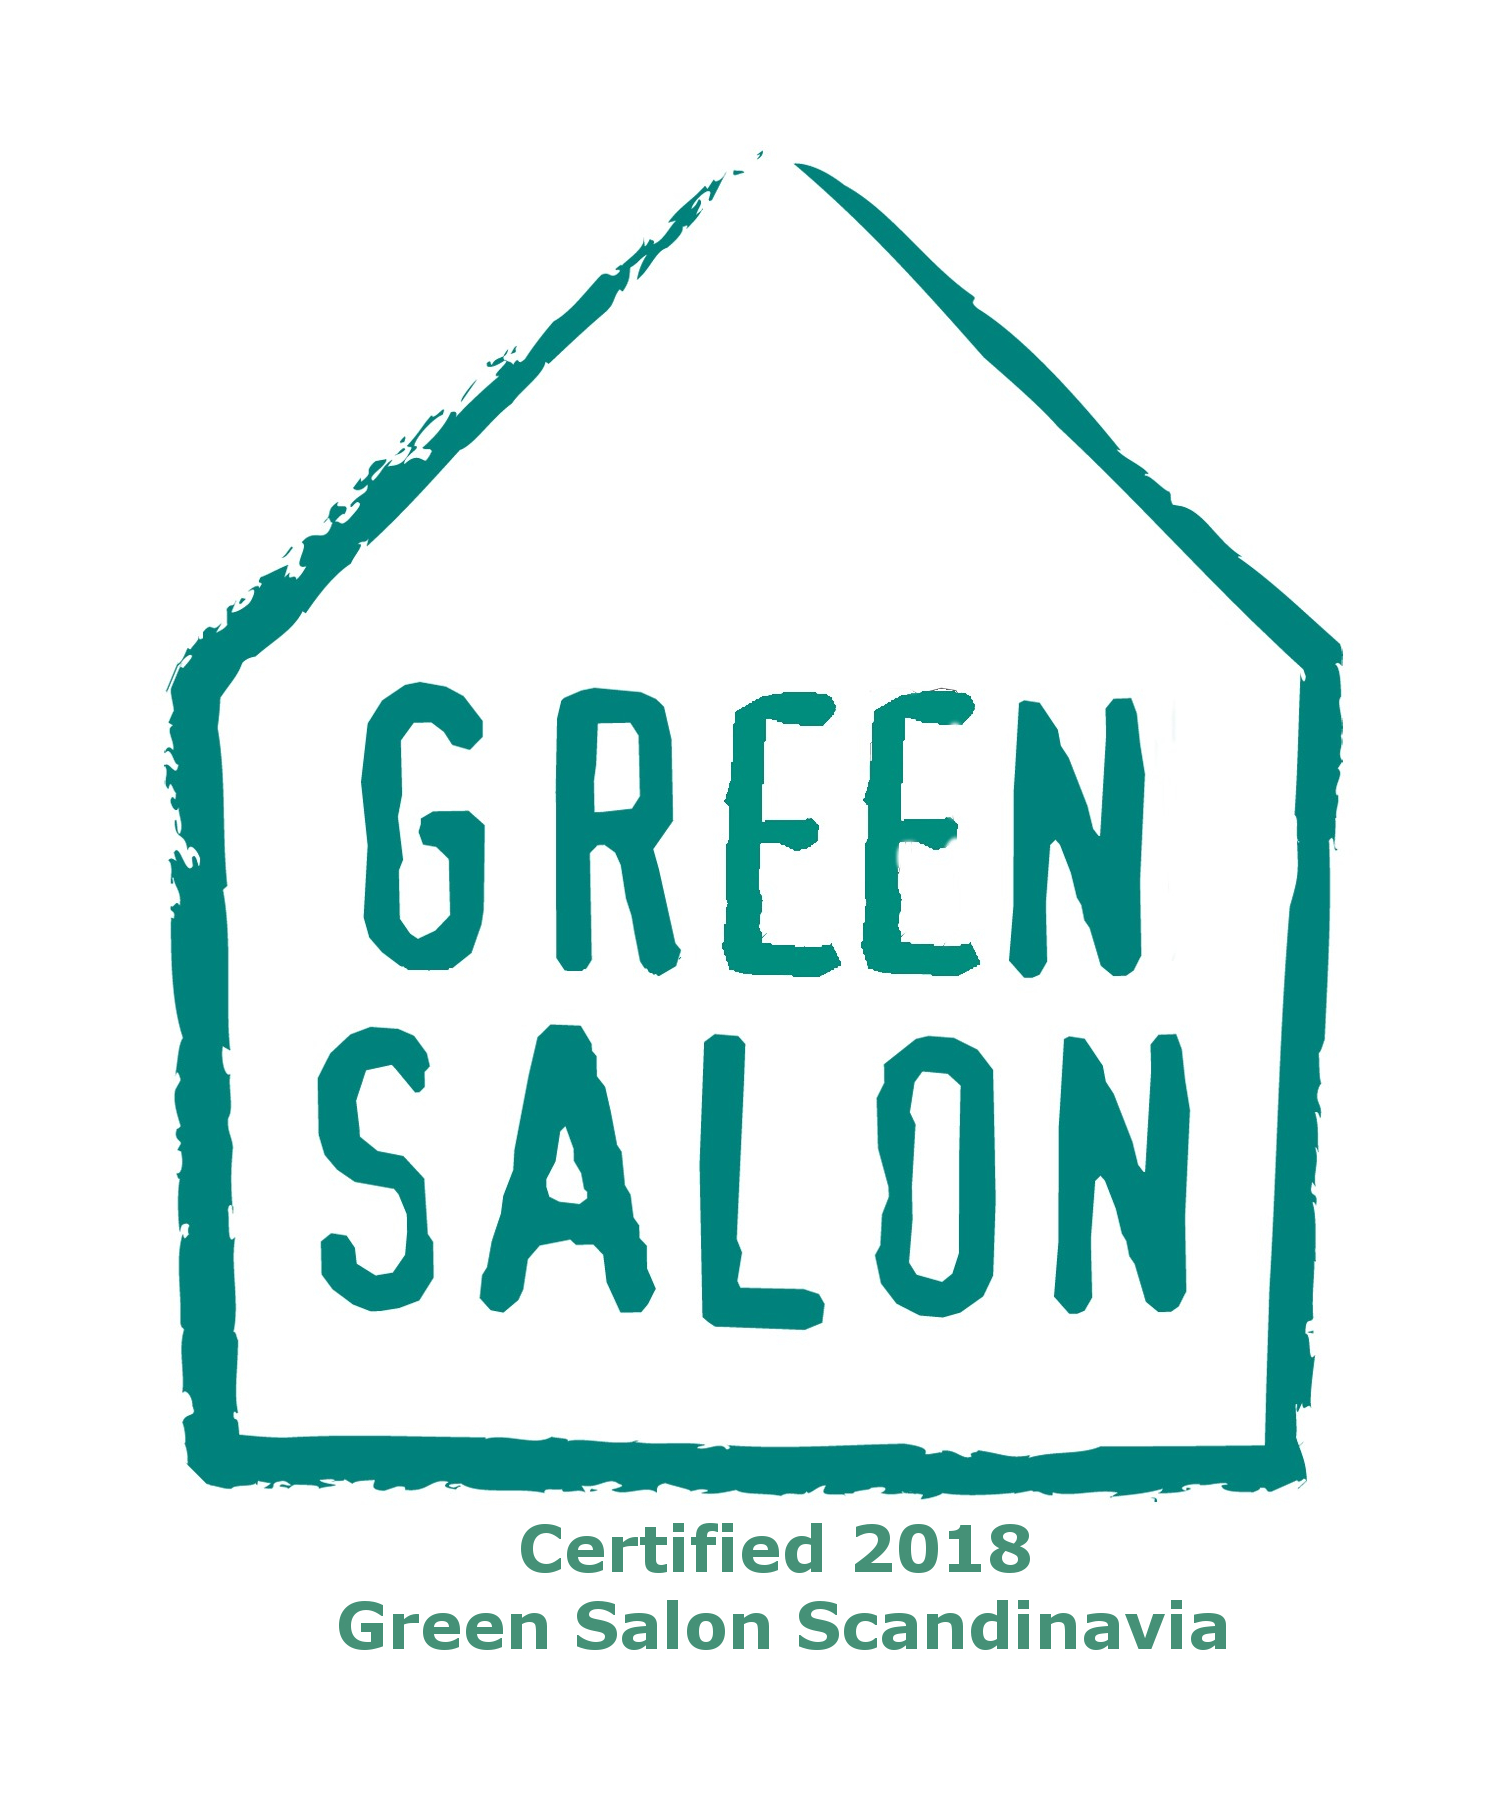 green salon 2018-5 nieuw 1